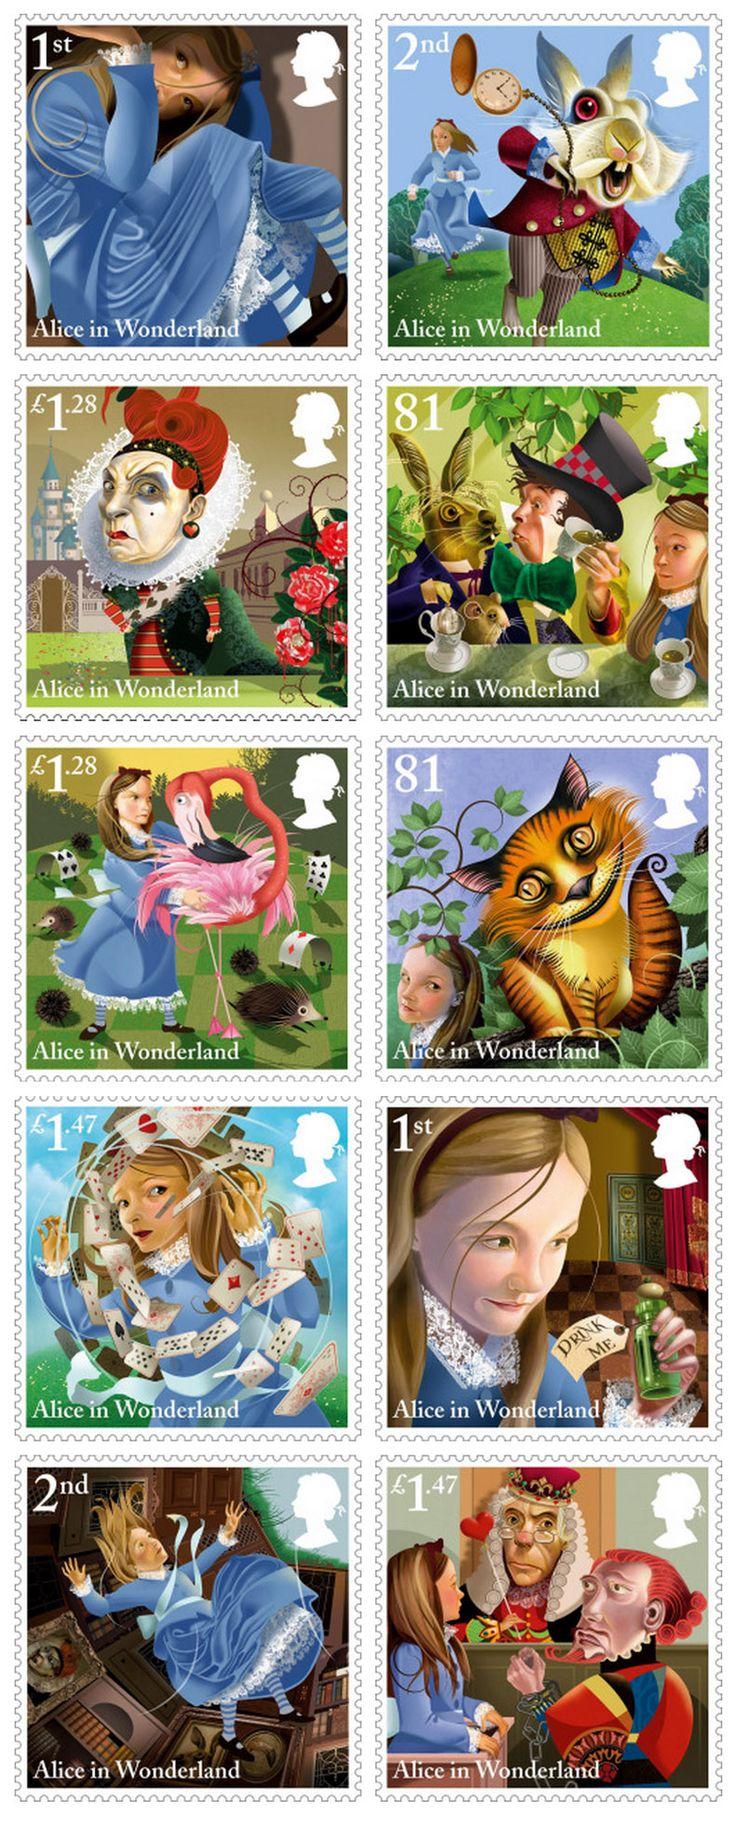 Alice's Adventures in Wonderland Stamp Set